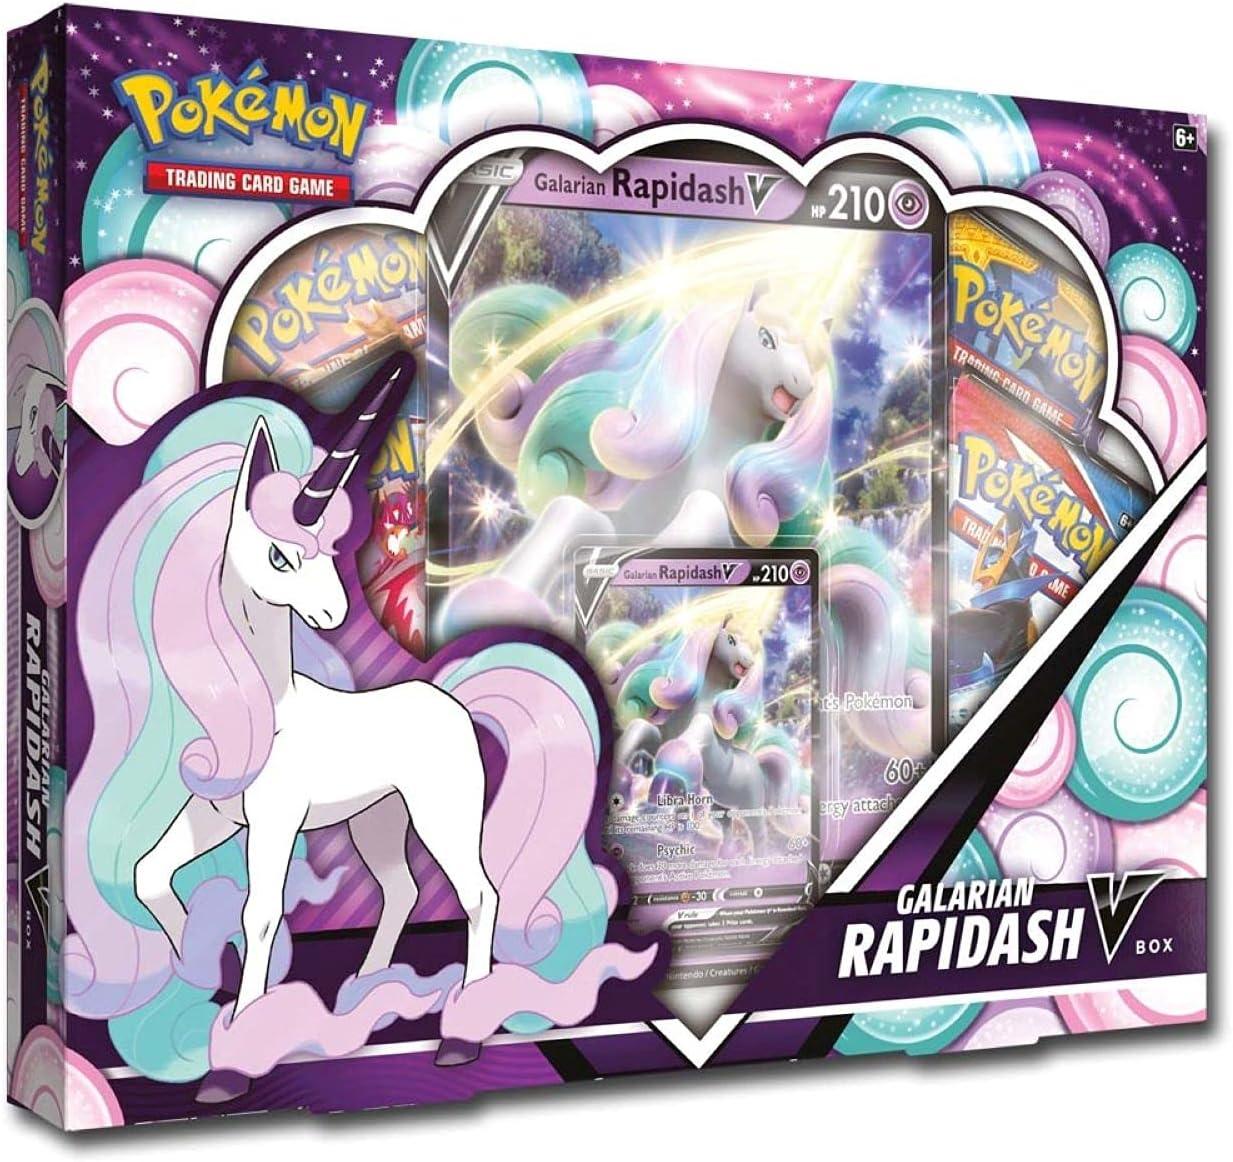 Pokémon TCG: Galarian Rapidash V Box 6. V Battle Decks, Multicolor